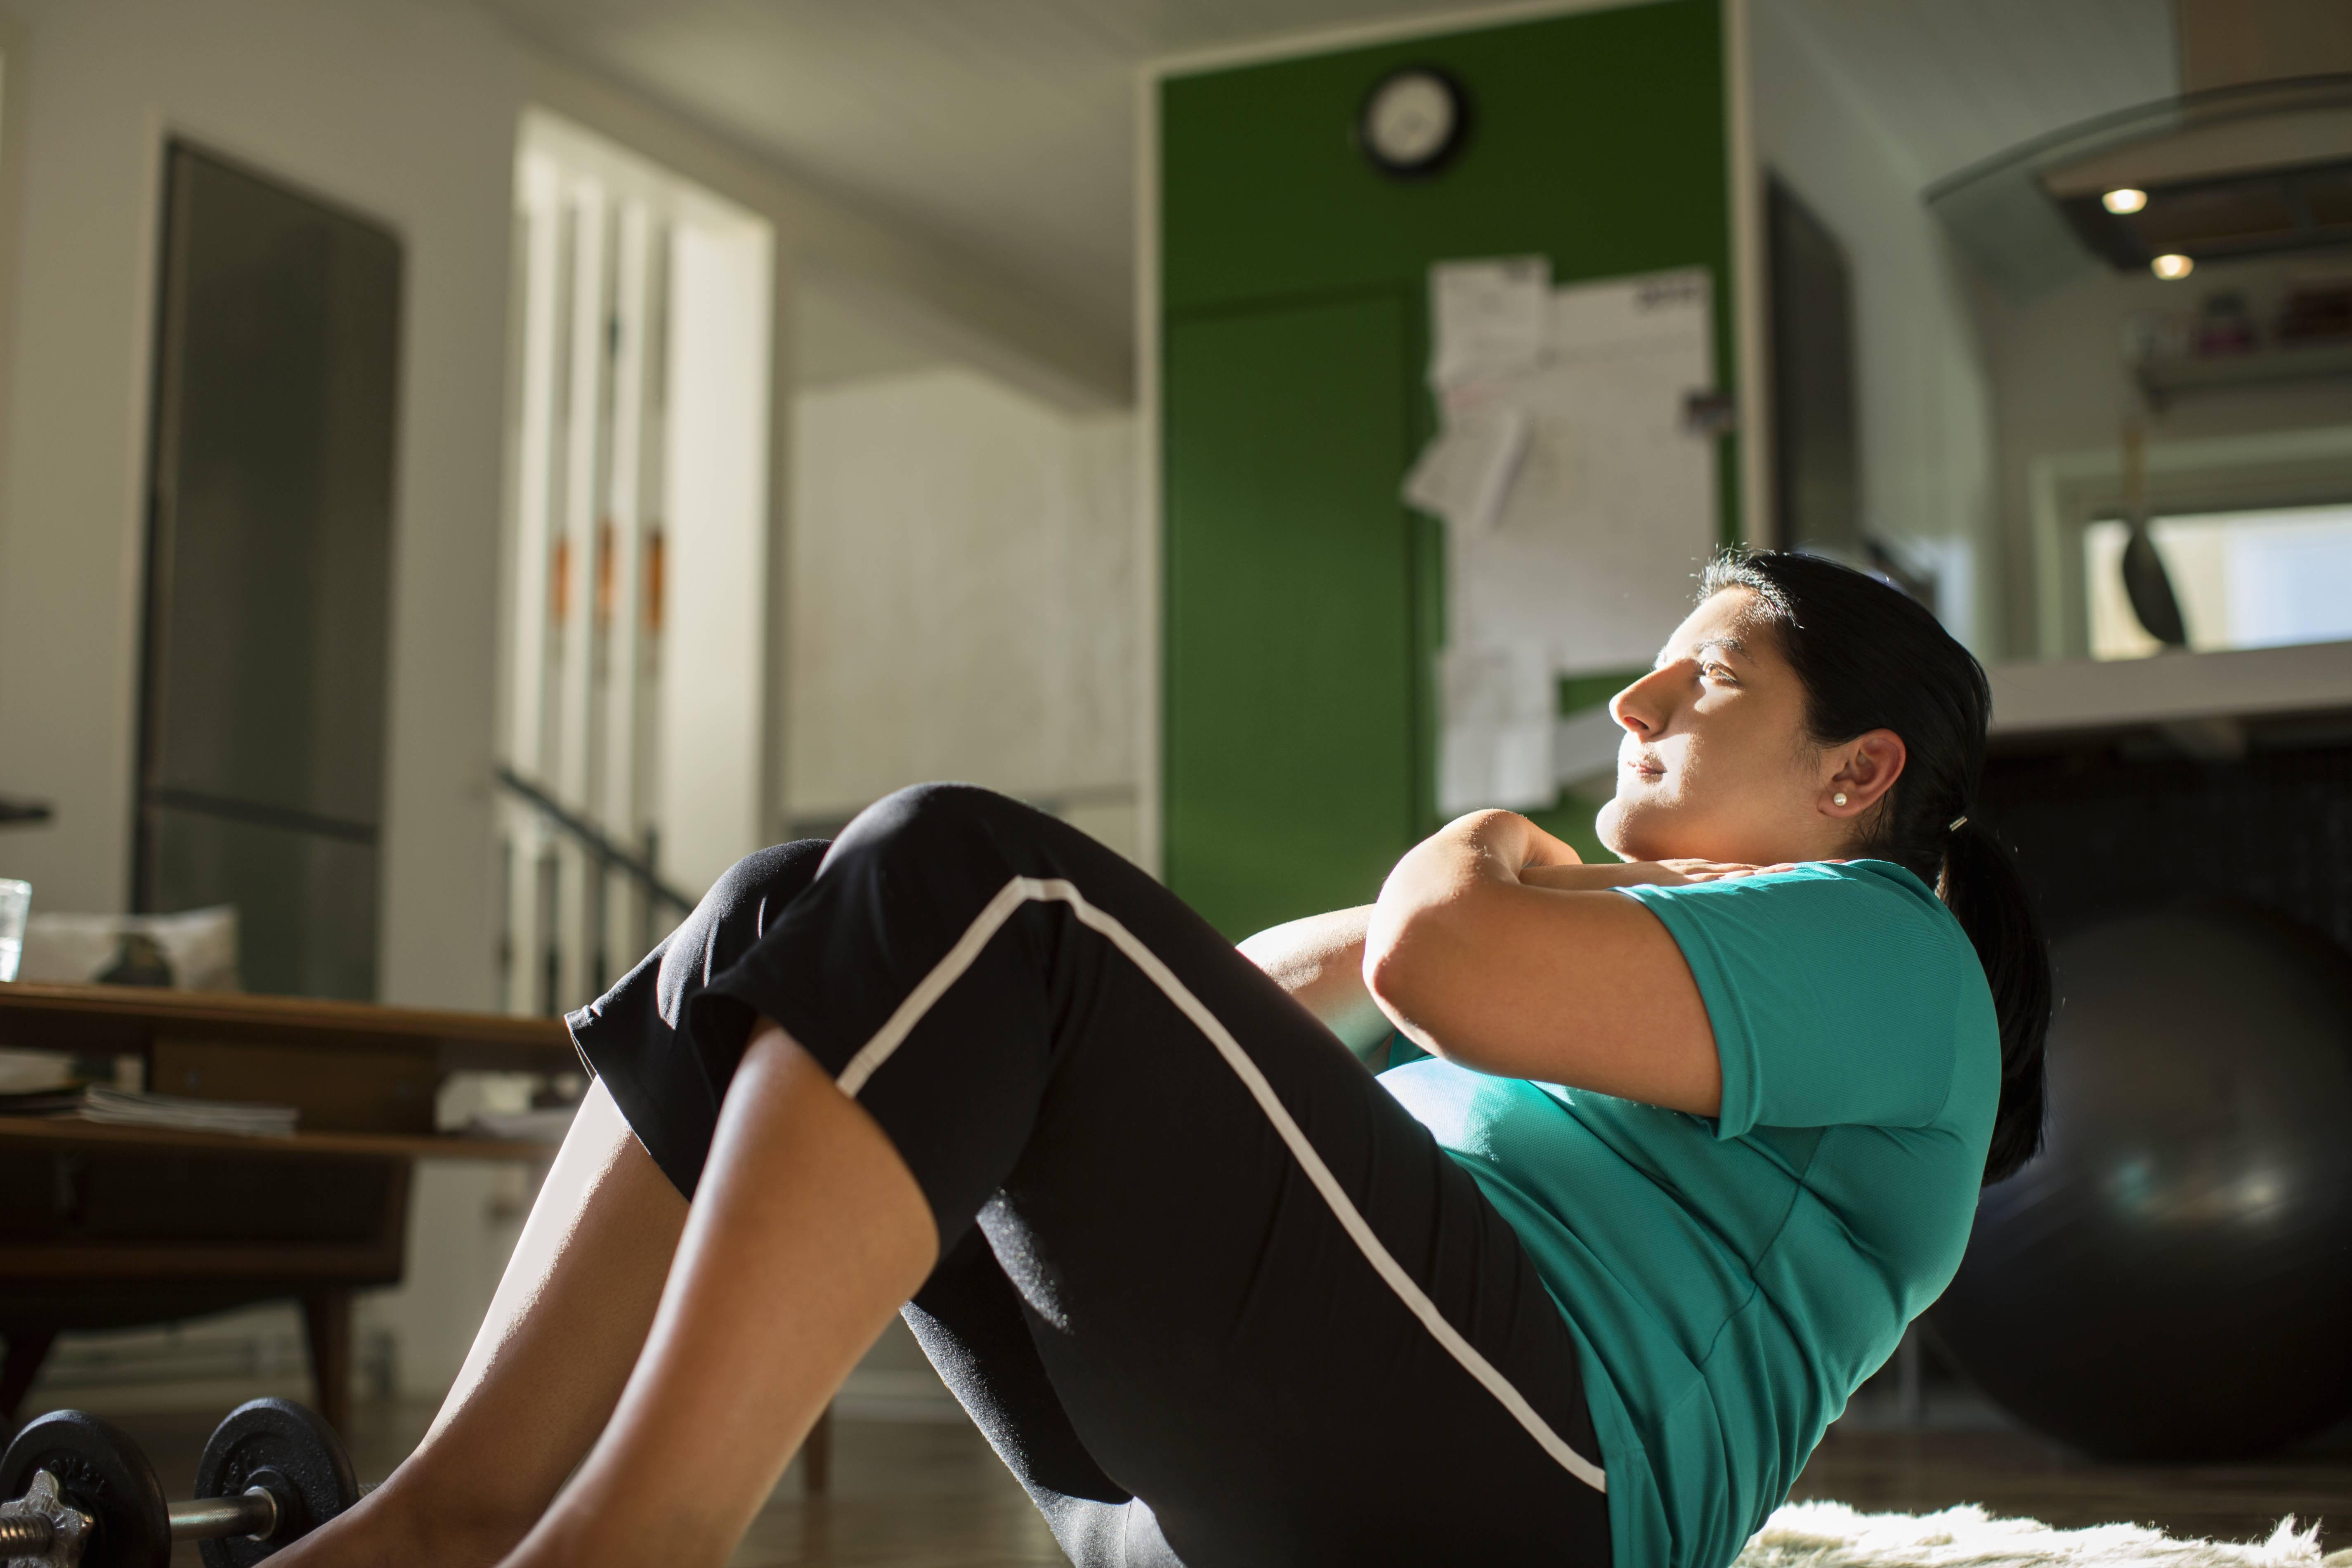 CDC obesity report